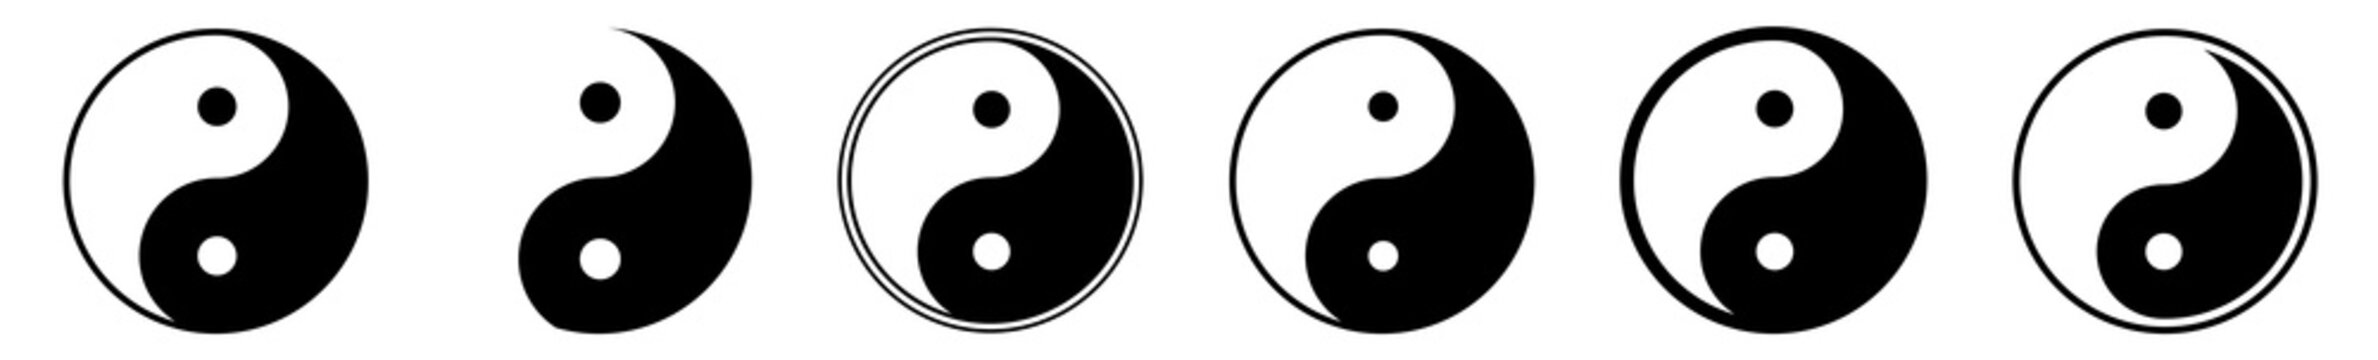 Yin Yang Sign Set | Yin-Yang Symbol Vector Illustration Logo | Yin Yang Opposite Yoga Karma Icon | Isolated Transparent